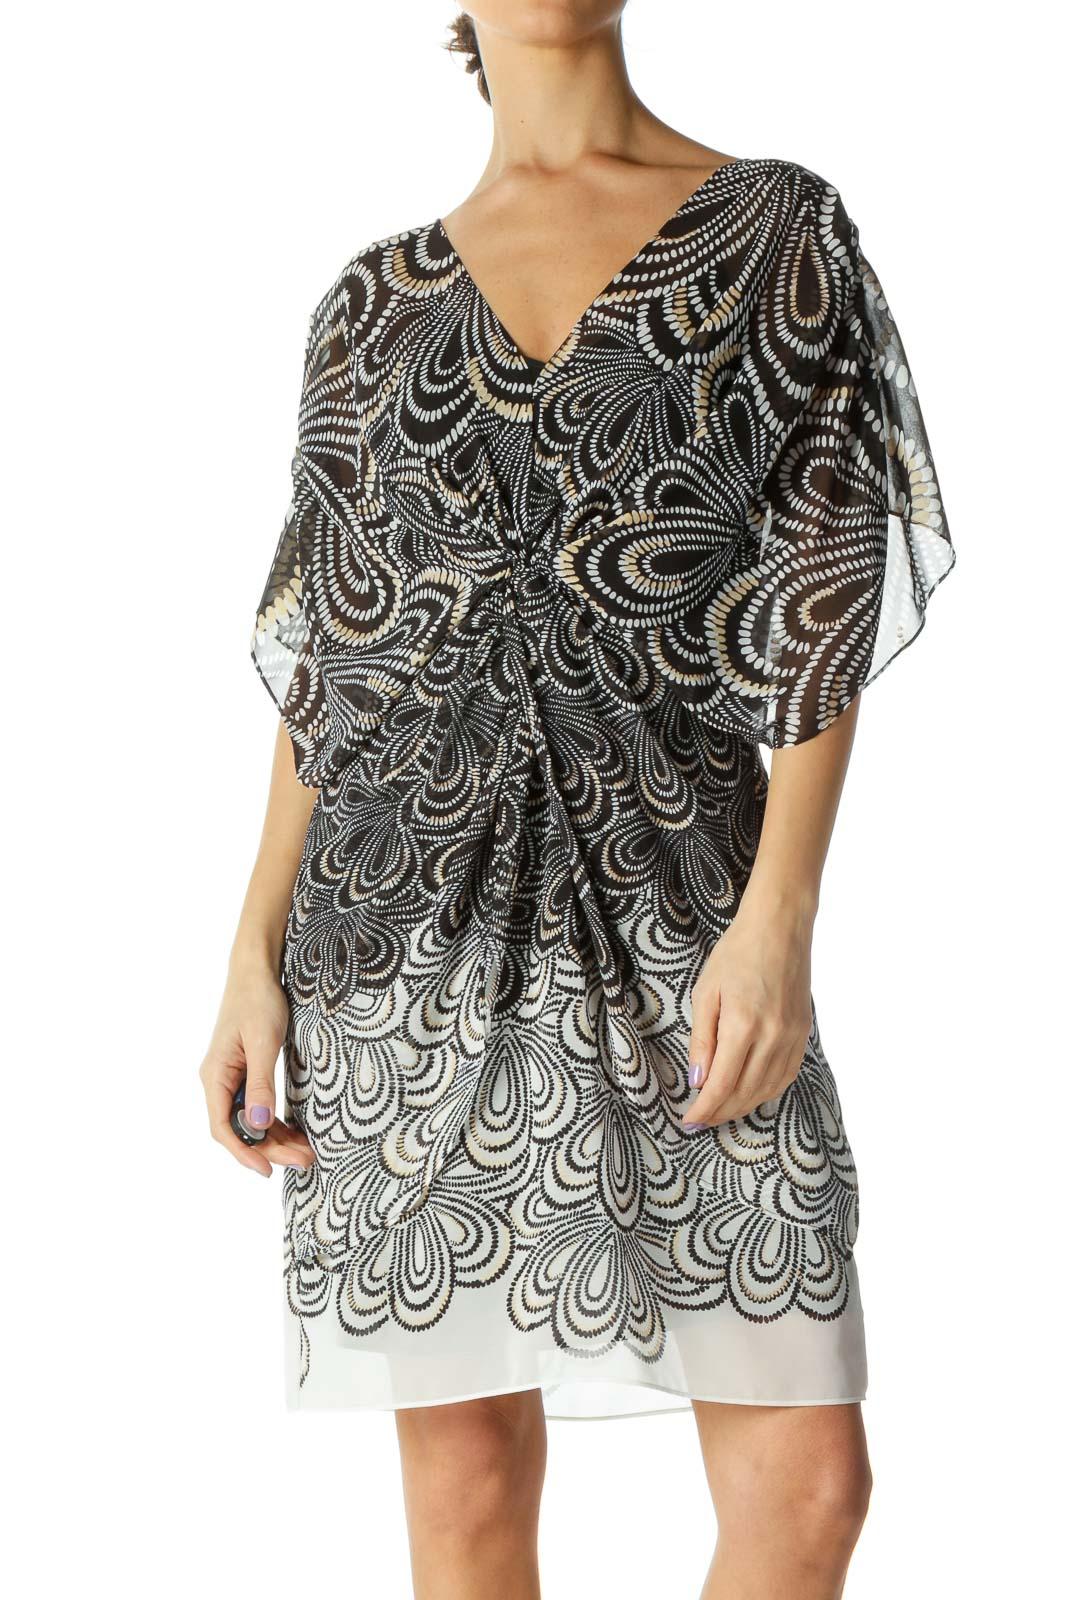 Black & White Pattern See Through Sun Dress Front